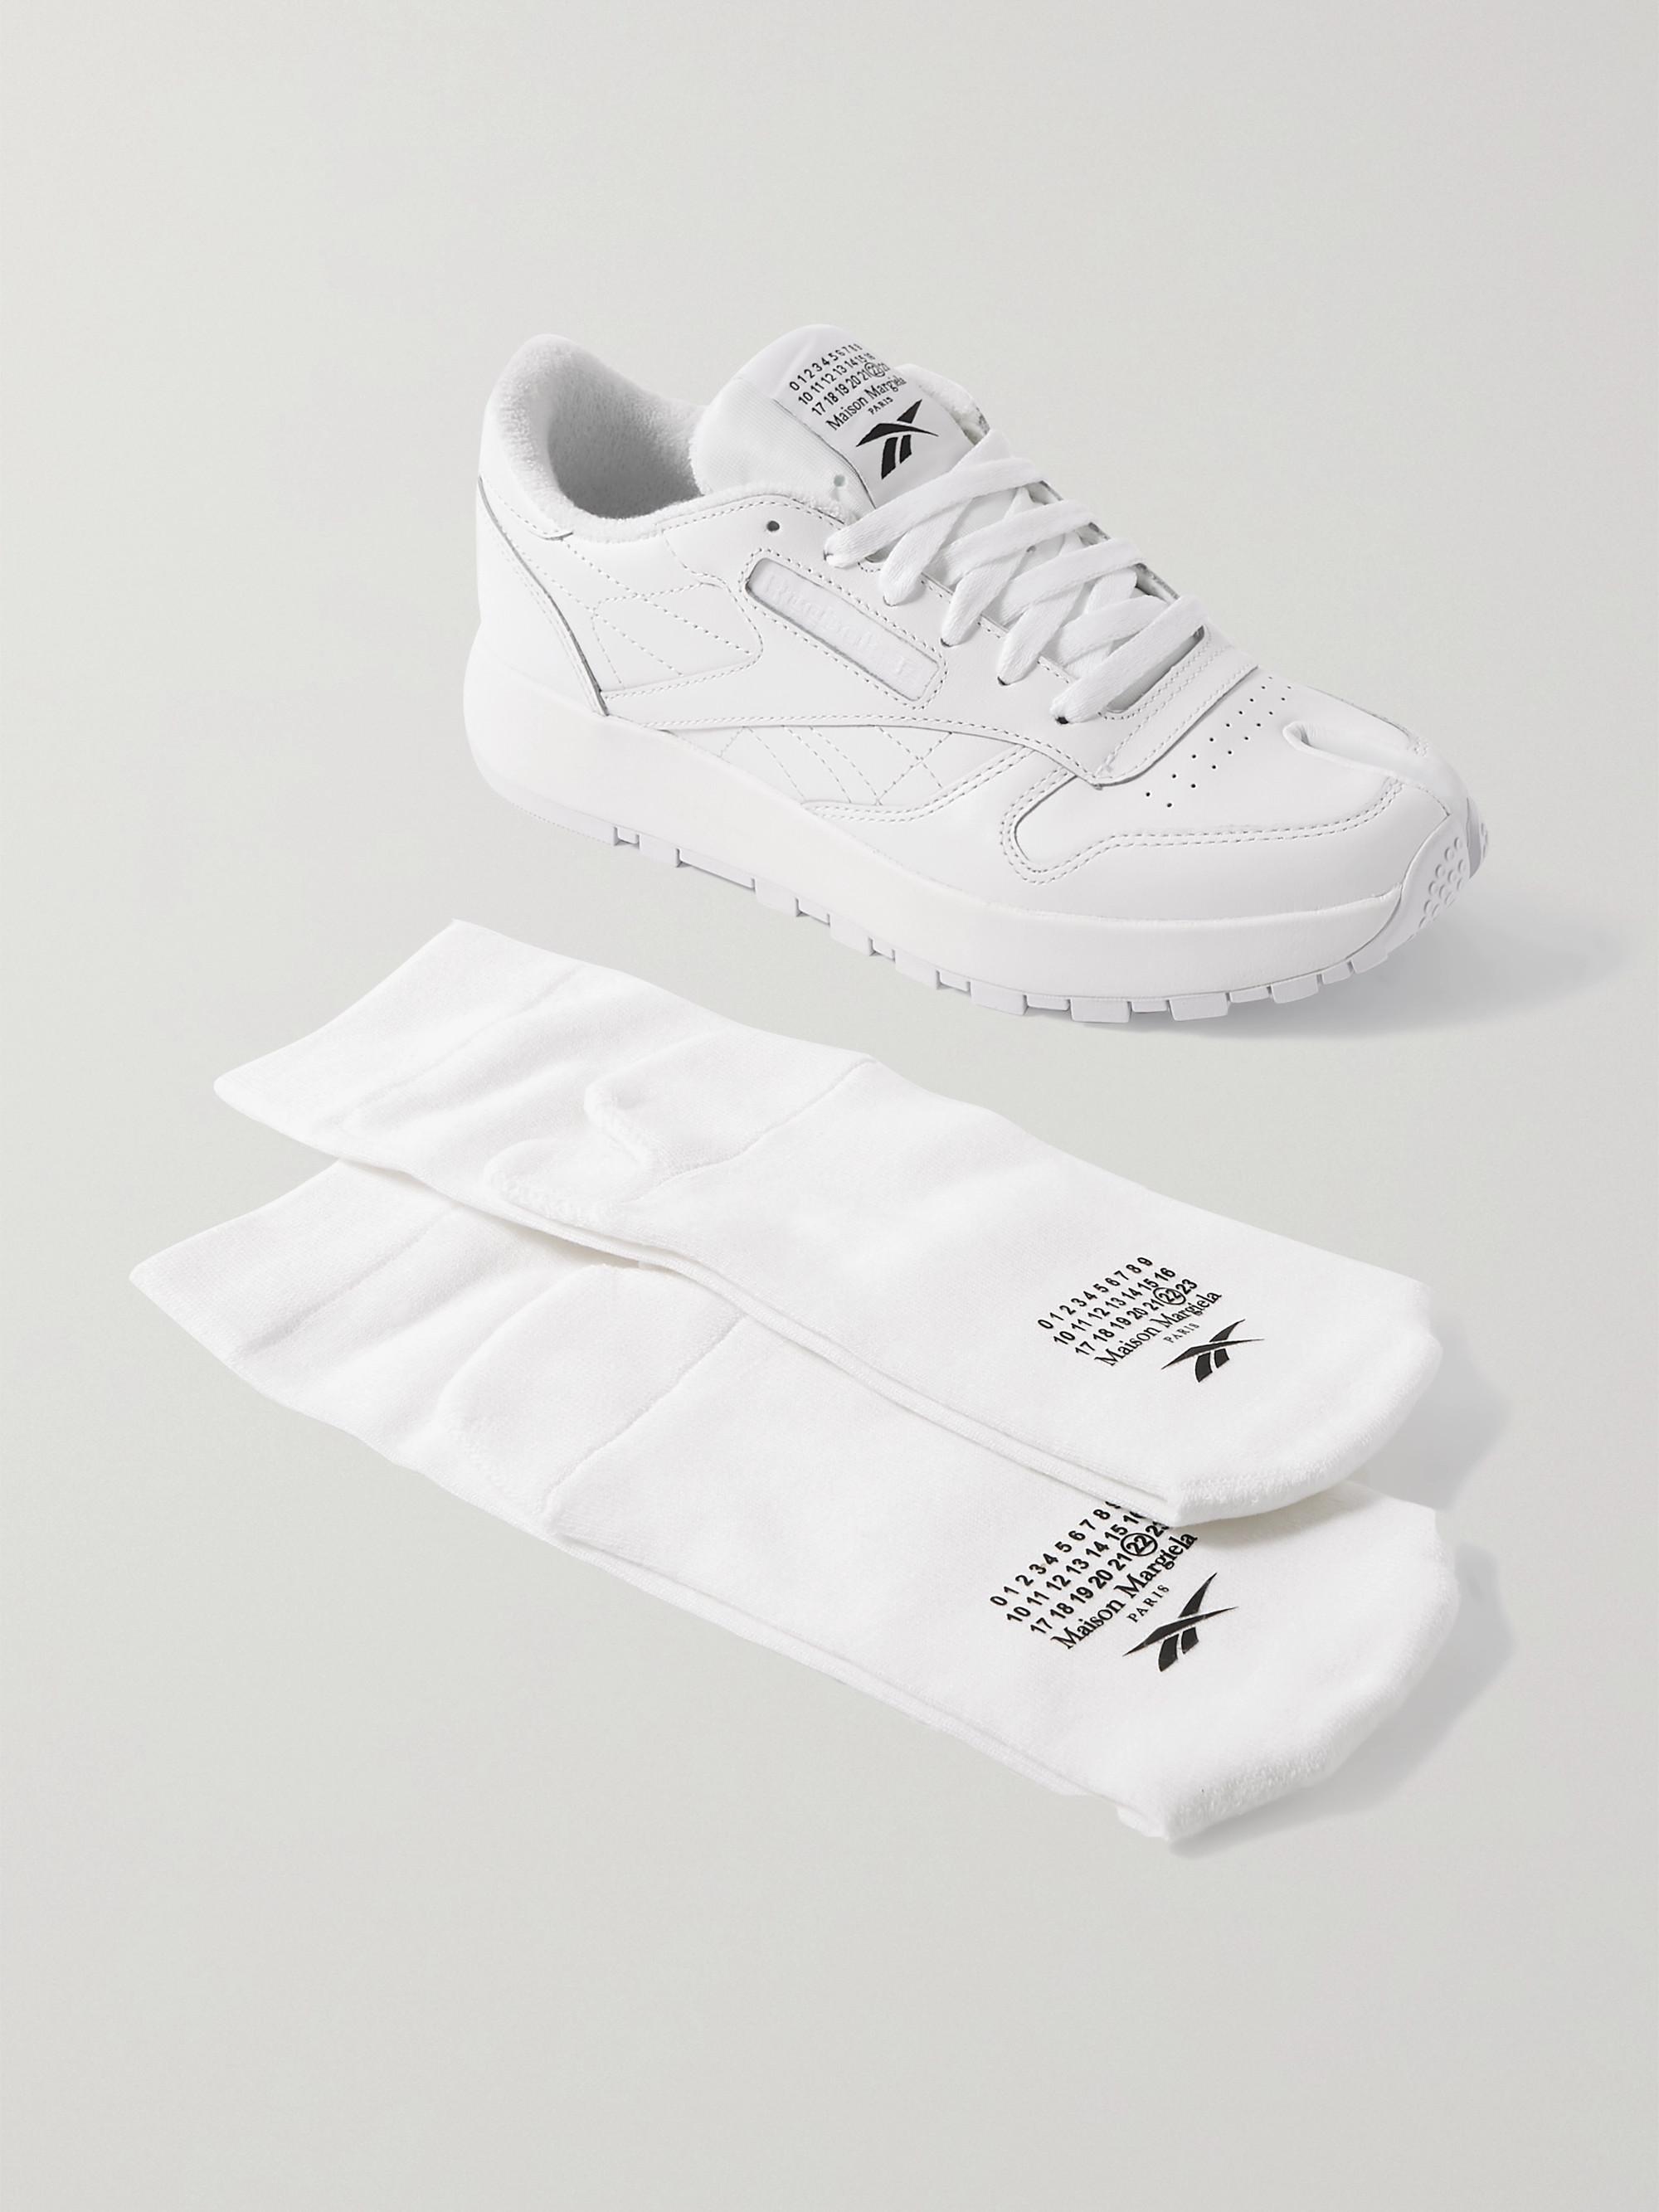 Reebok + Maison Margiela Tabi split-toe leather sneakers and cotton-blend socks set